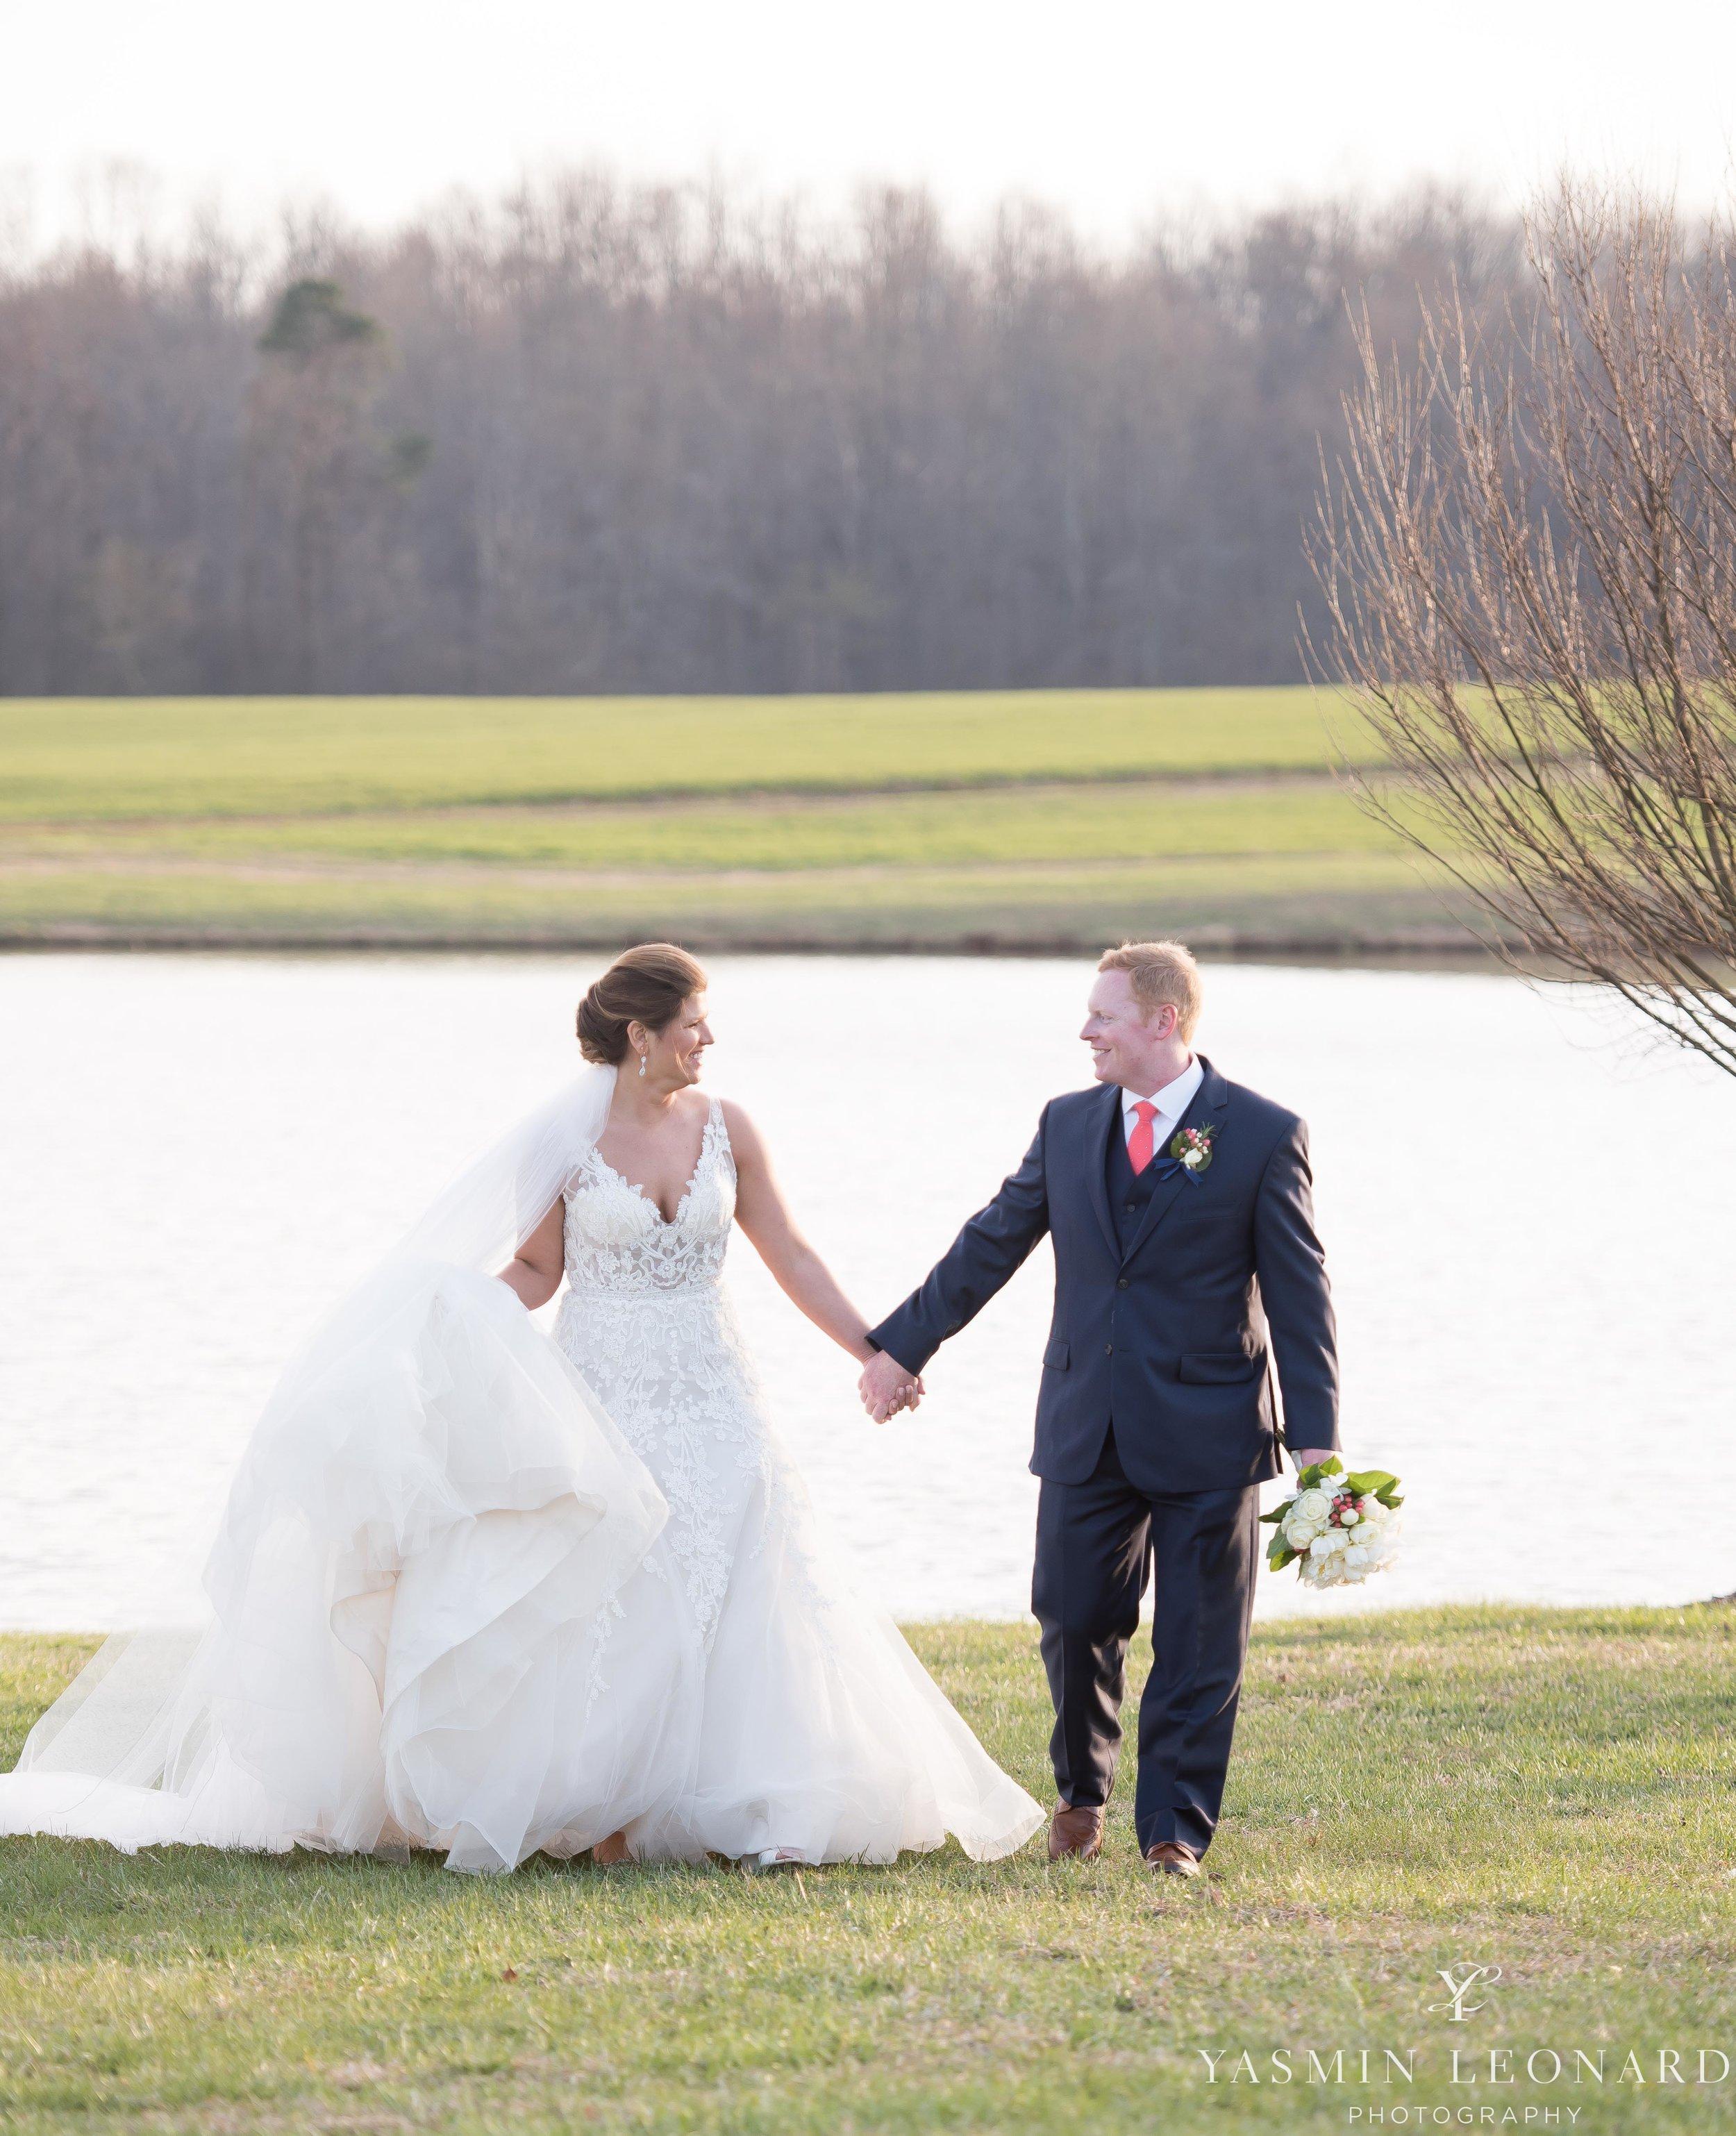 Adaumont Farm - Adaumont Farm Weddings - Trinity Weddings - NC Weddings - Yasmin Leonard Photography-49.jpg